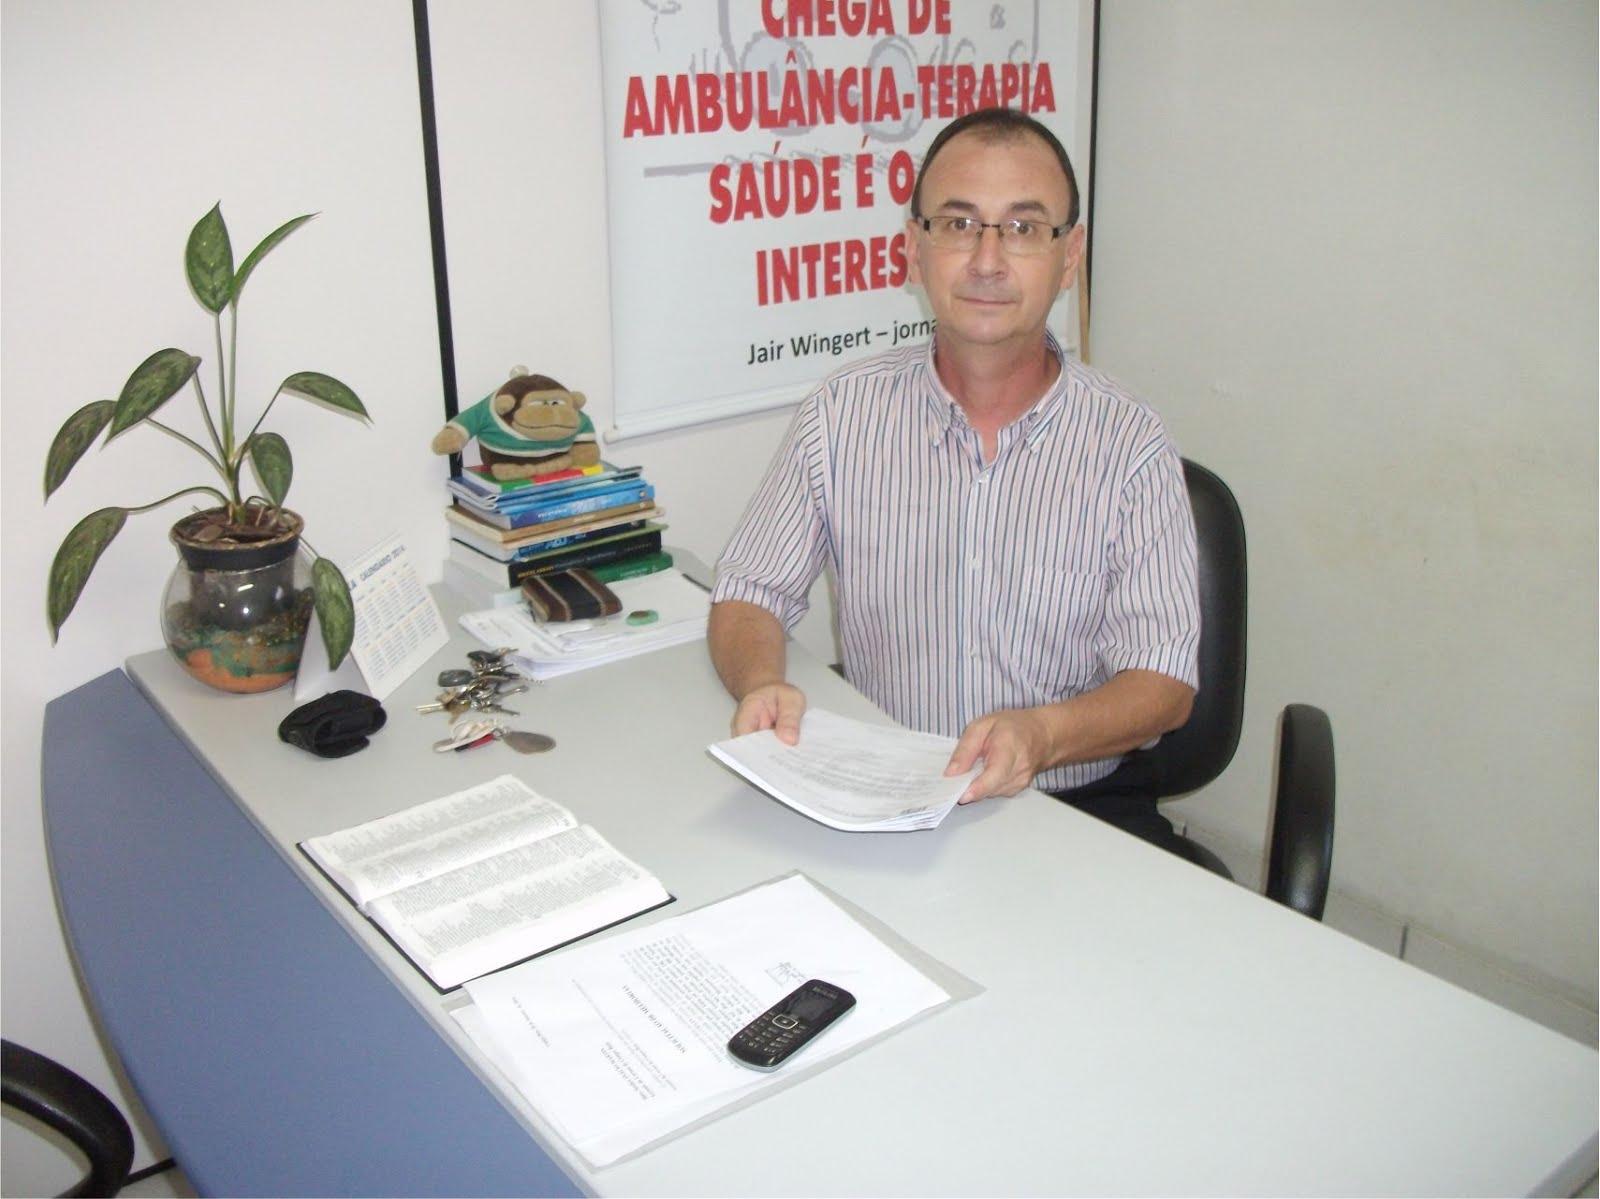 JAIR WINGERT DEFENDE O FIM DO SEMIABERTO